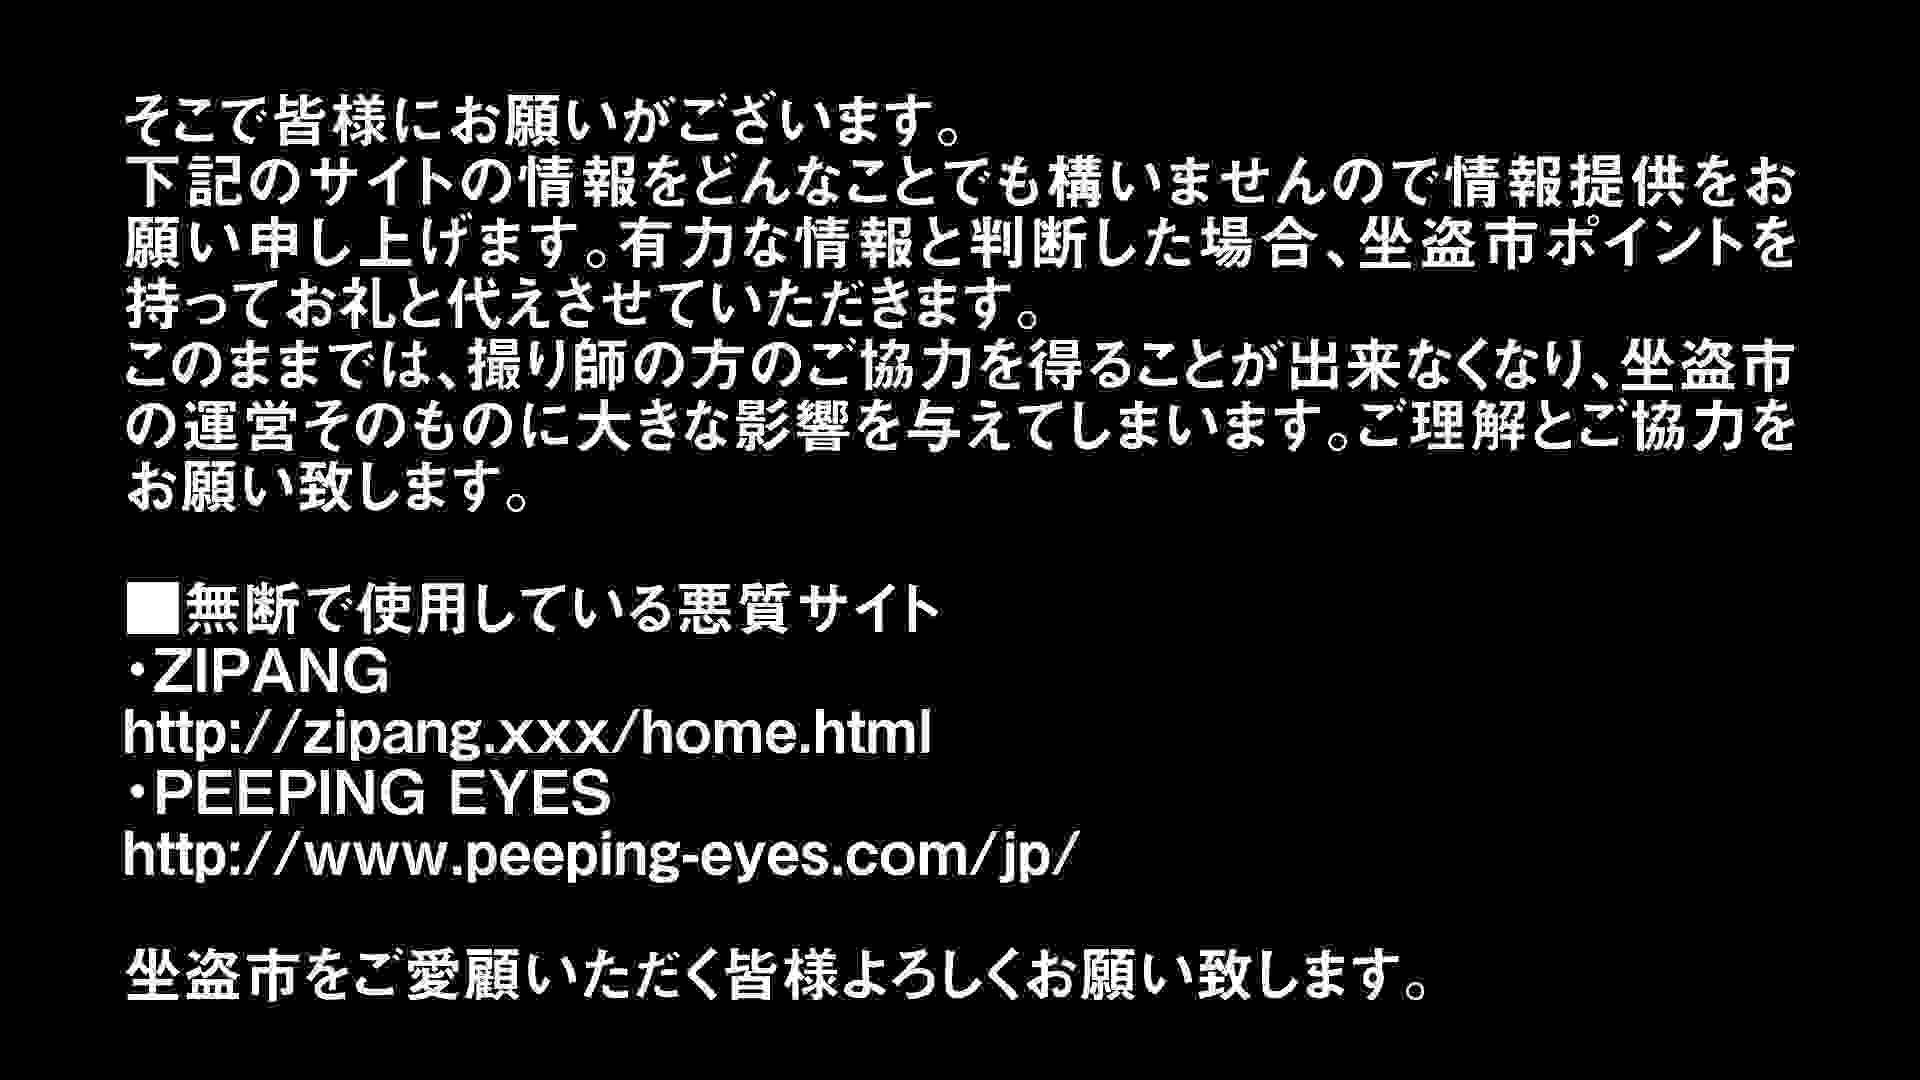 Aquaな露天風呂Vol.294 露天 セックス無修正動画無料 75画像 29